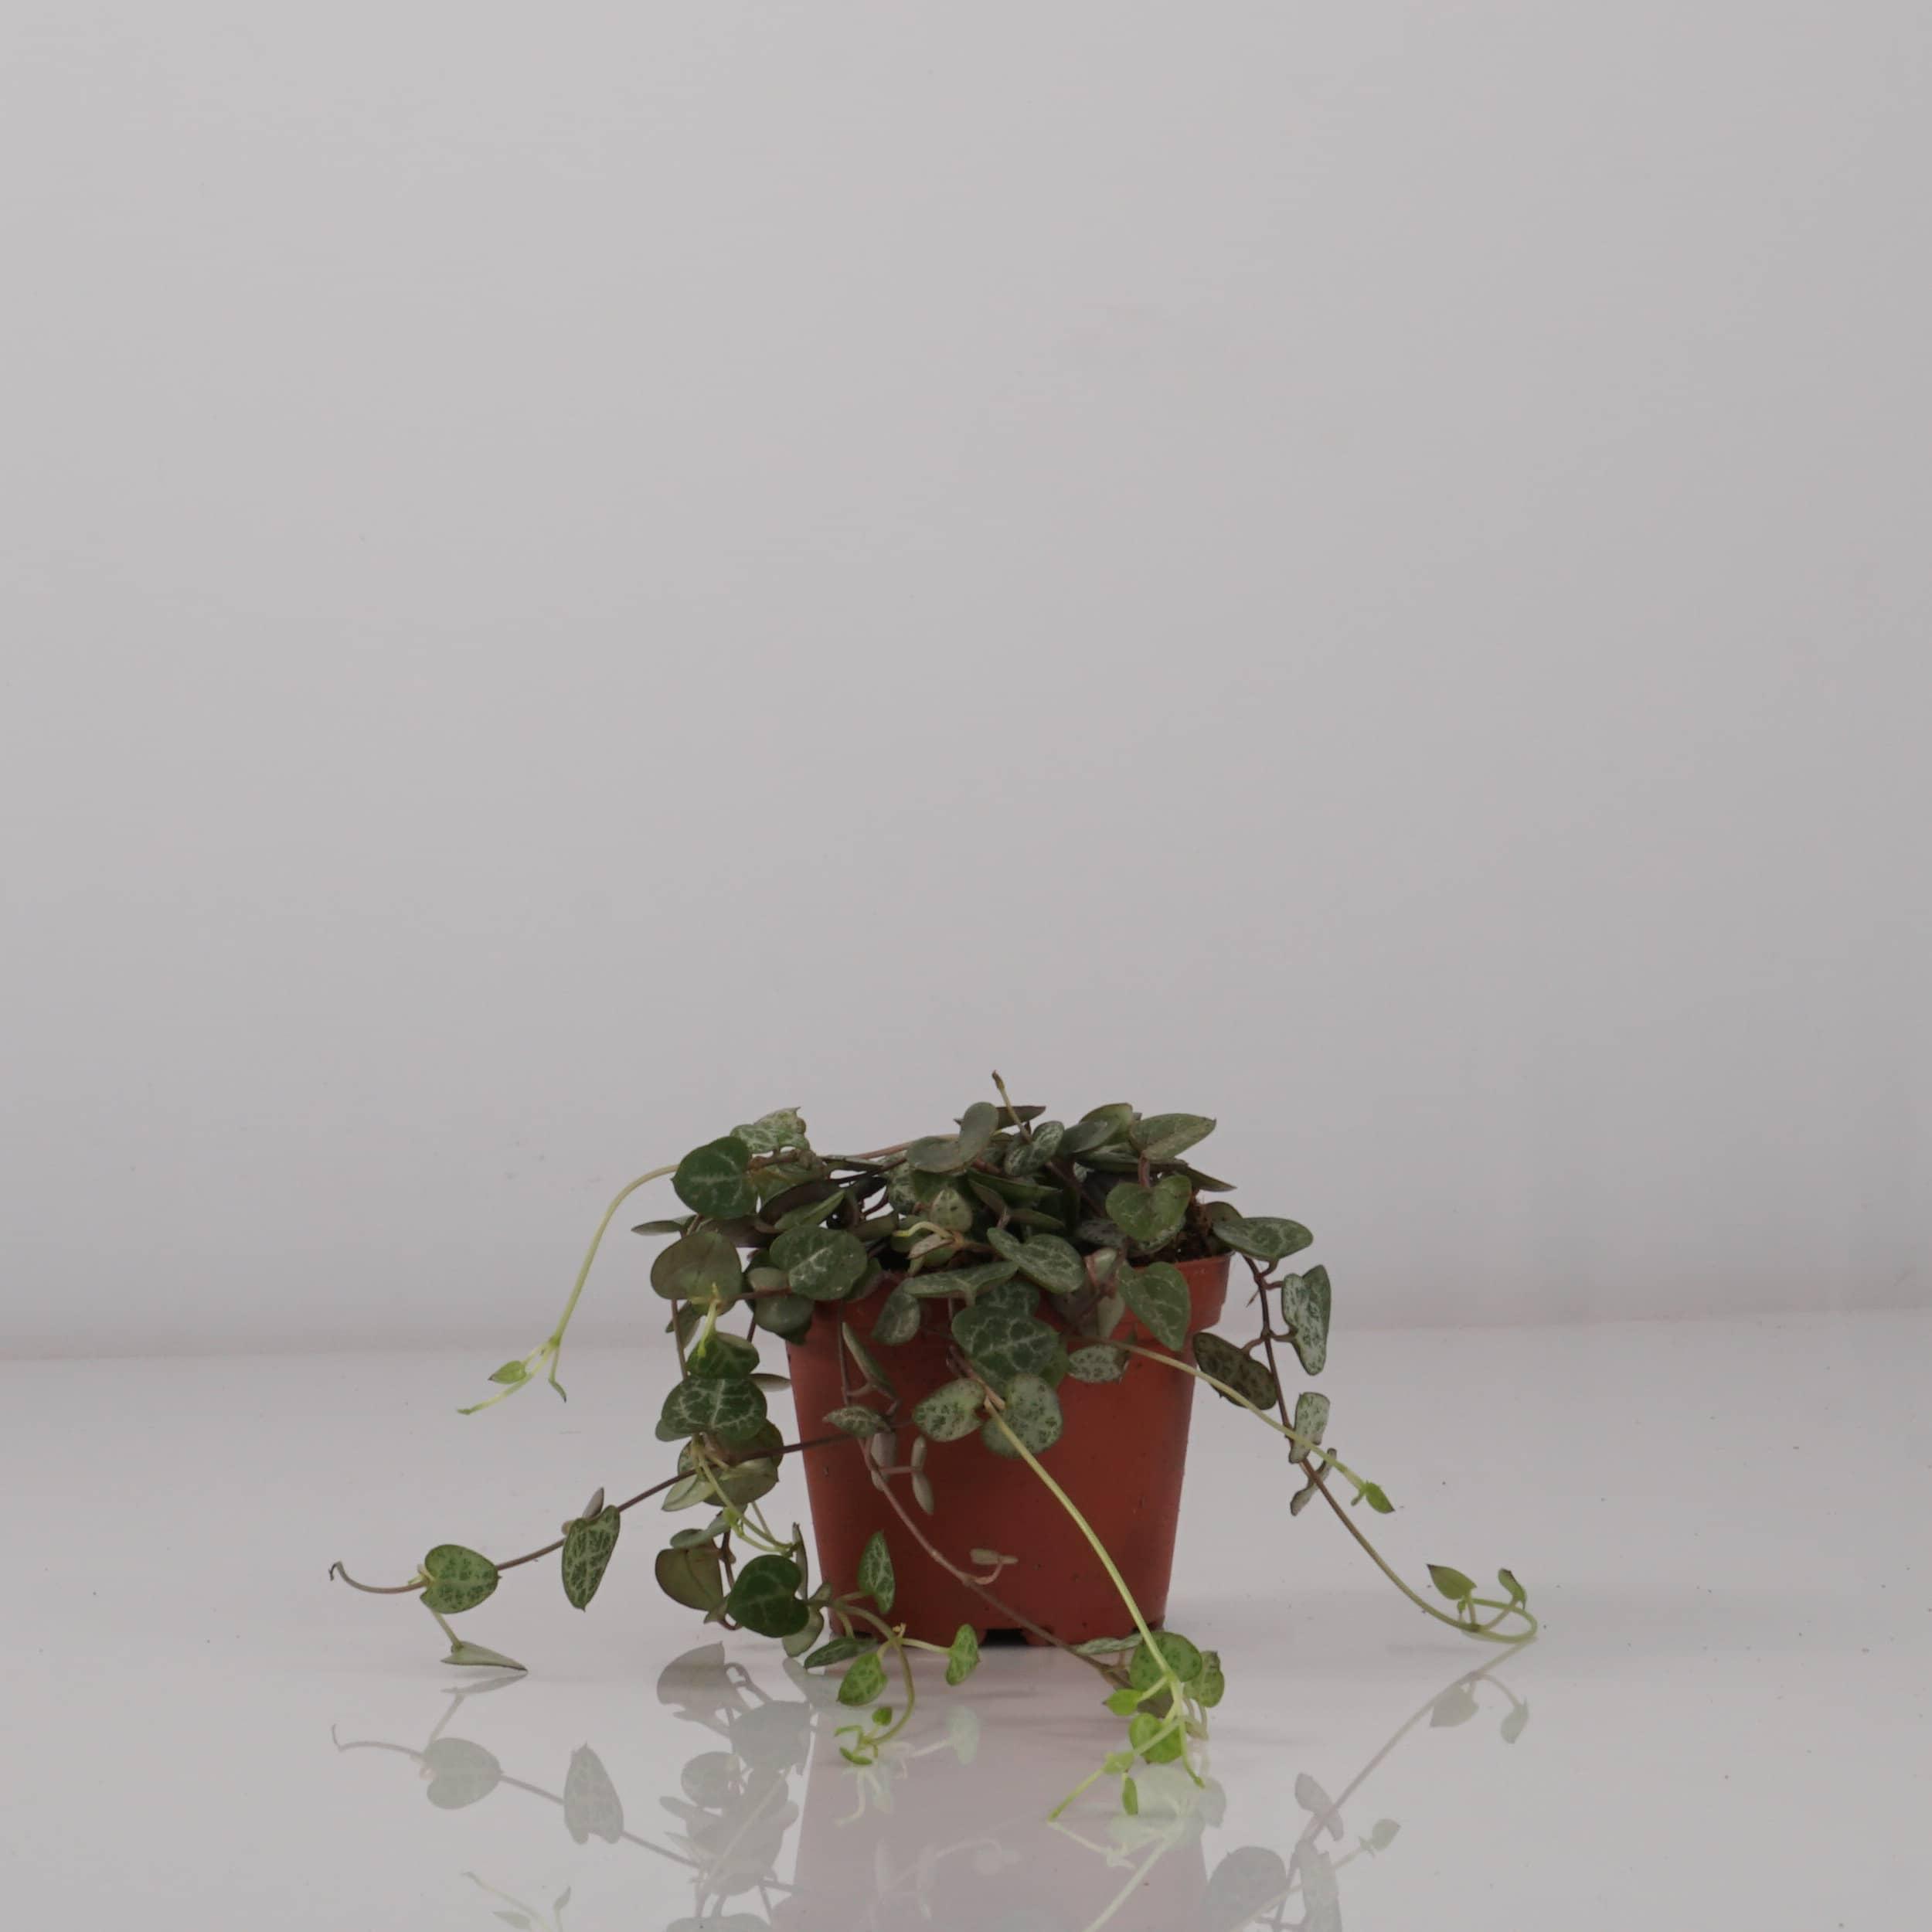 Ceropegia woodii - Leuchterblume